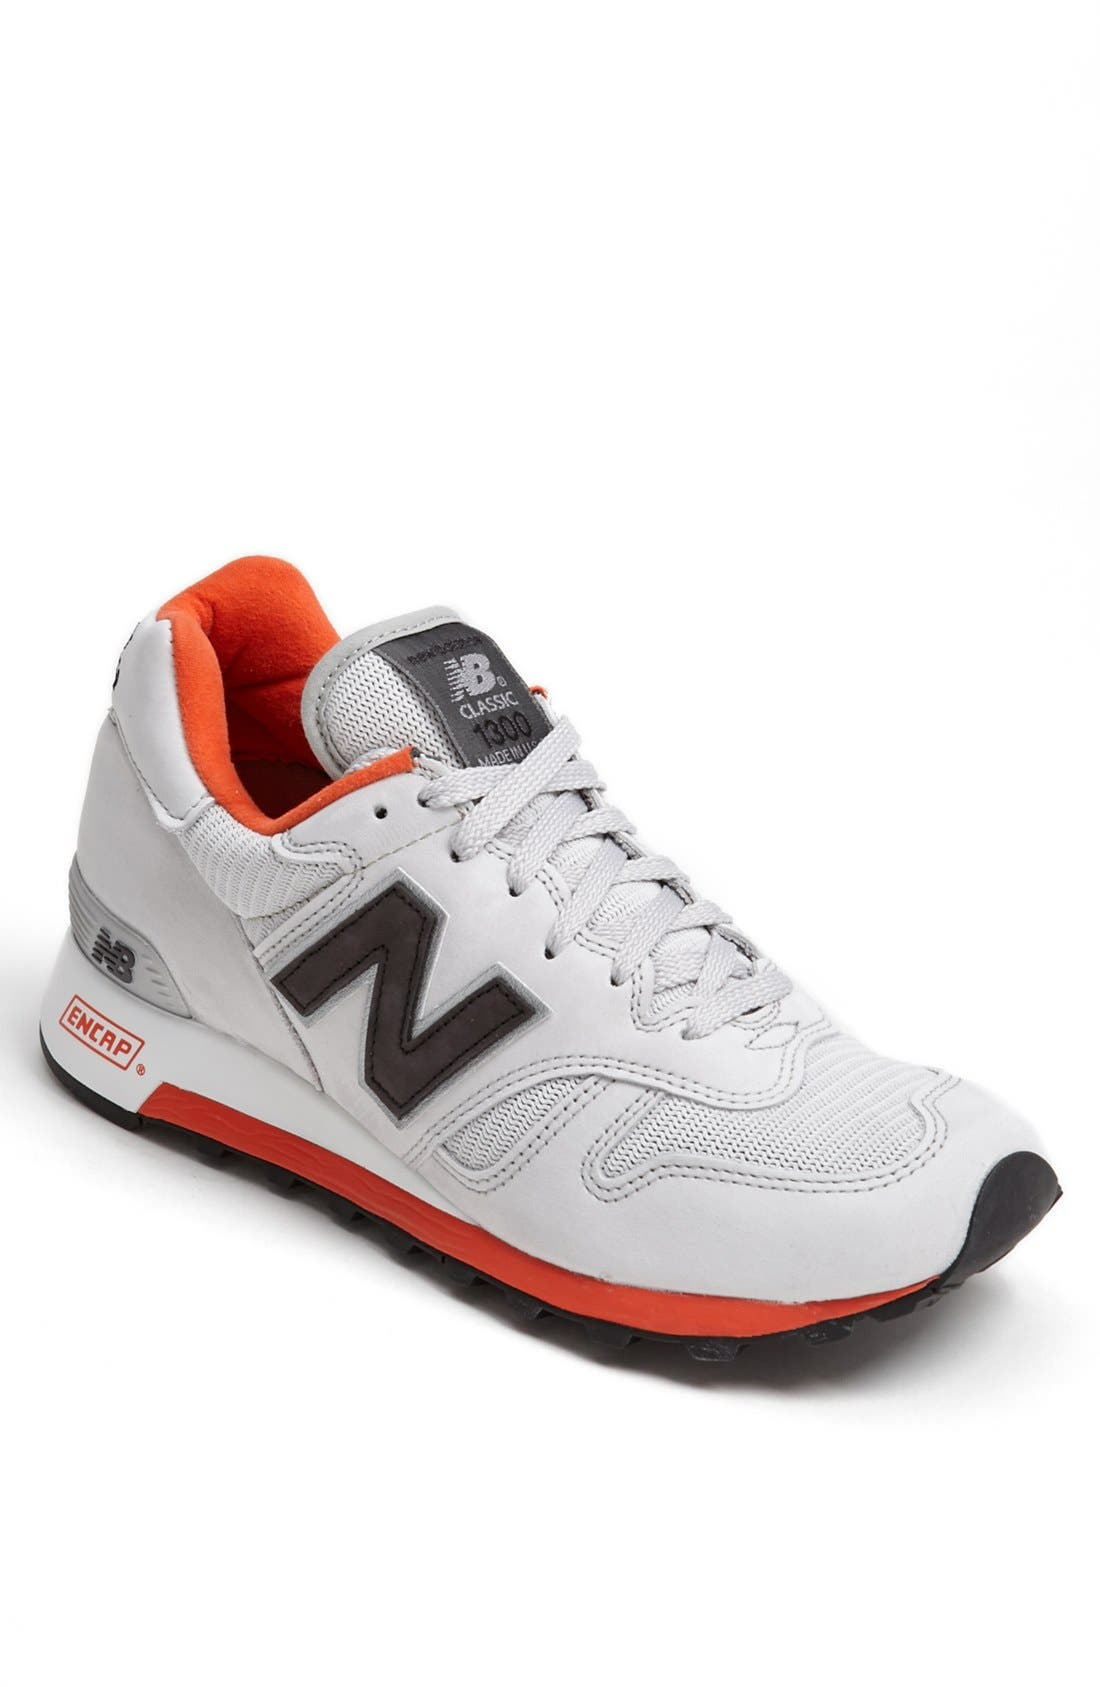 Main Image - New Balance '1300 Classic' Sneaker (Men)